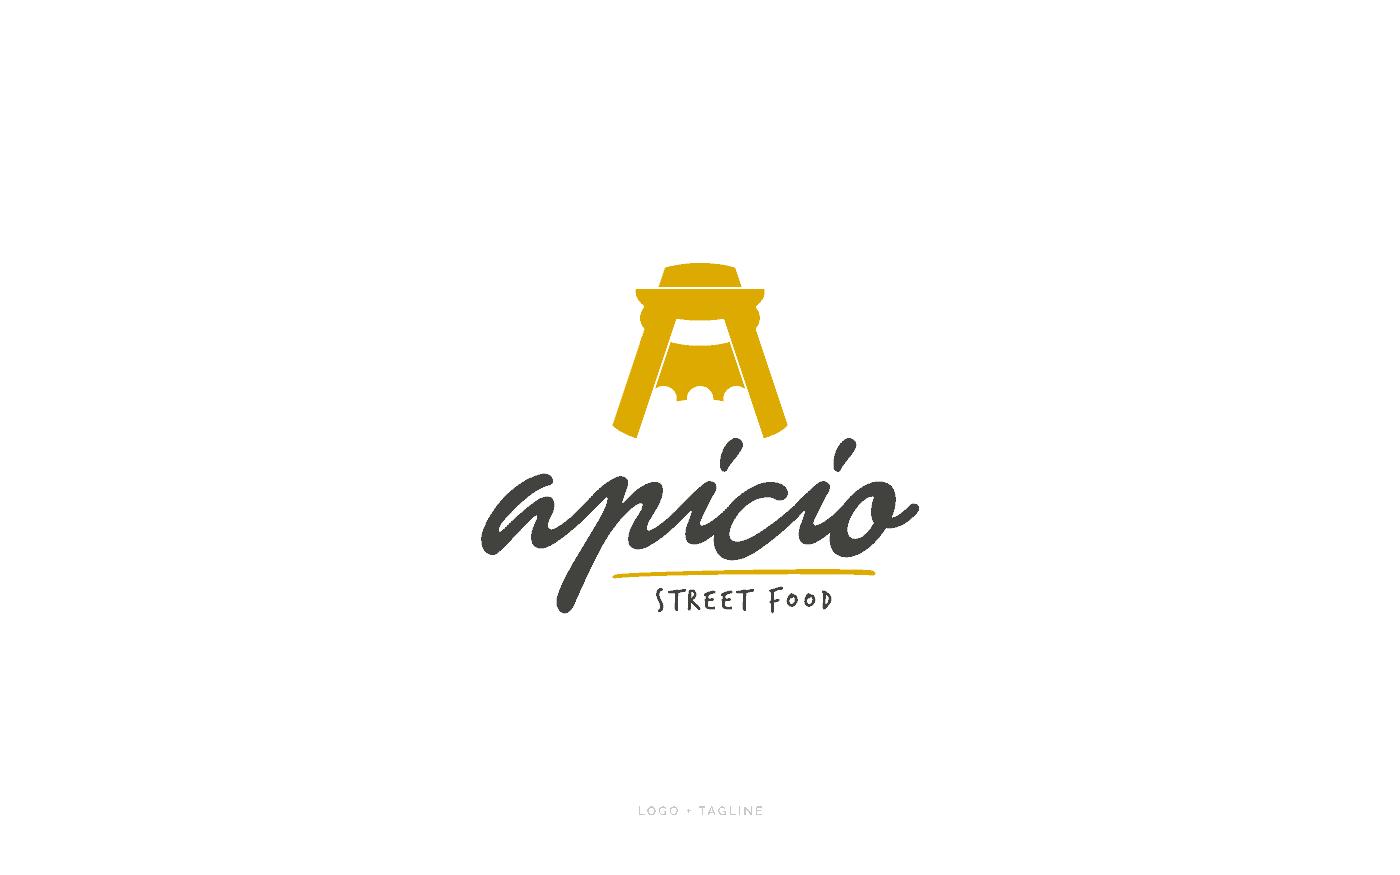 Apicio Street Food Logo Tagline